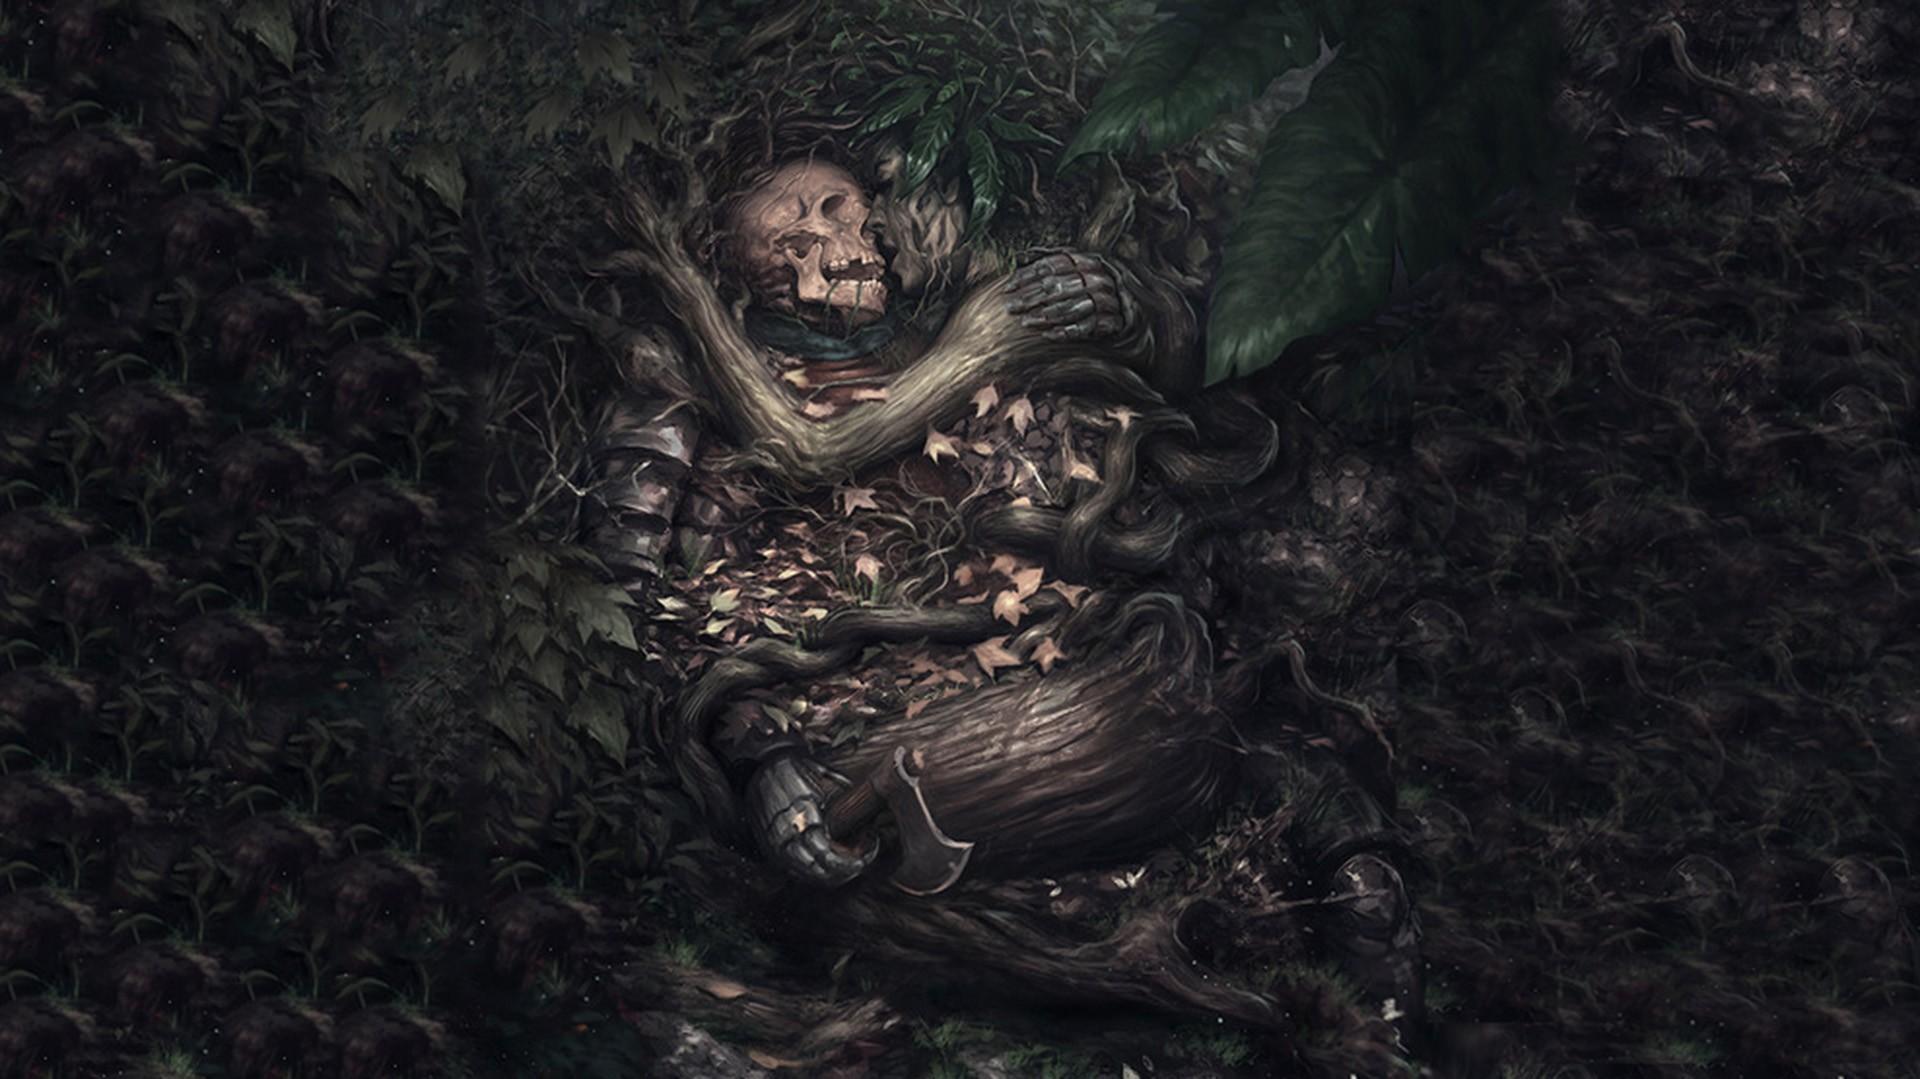 Cool Wallpaper Love Fantasy - painting-fantasy-art-horror-love-artwork-wood-skull-jungle-mythology-darkness-screenshot-fictional-character-182970  Photograph_873021.jpg